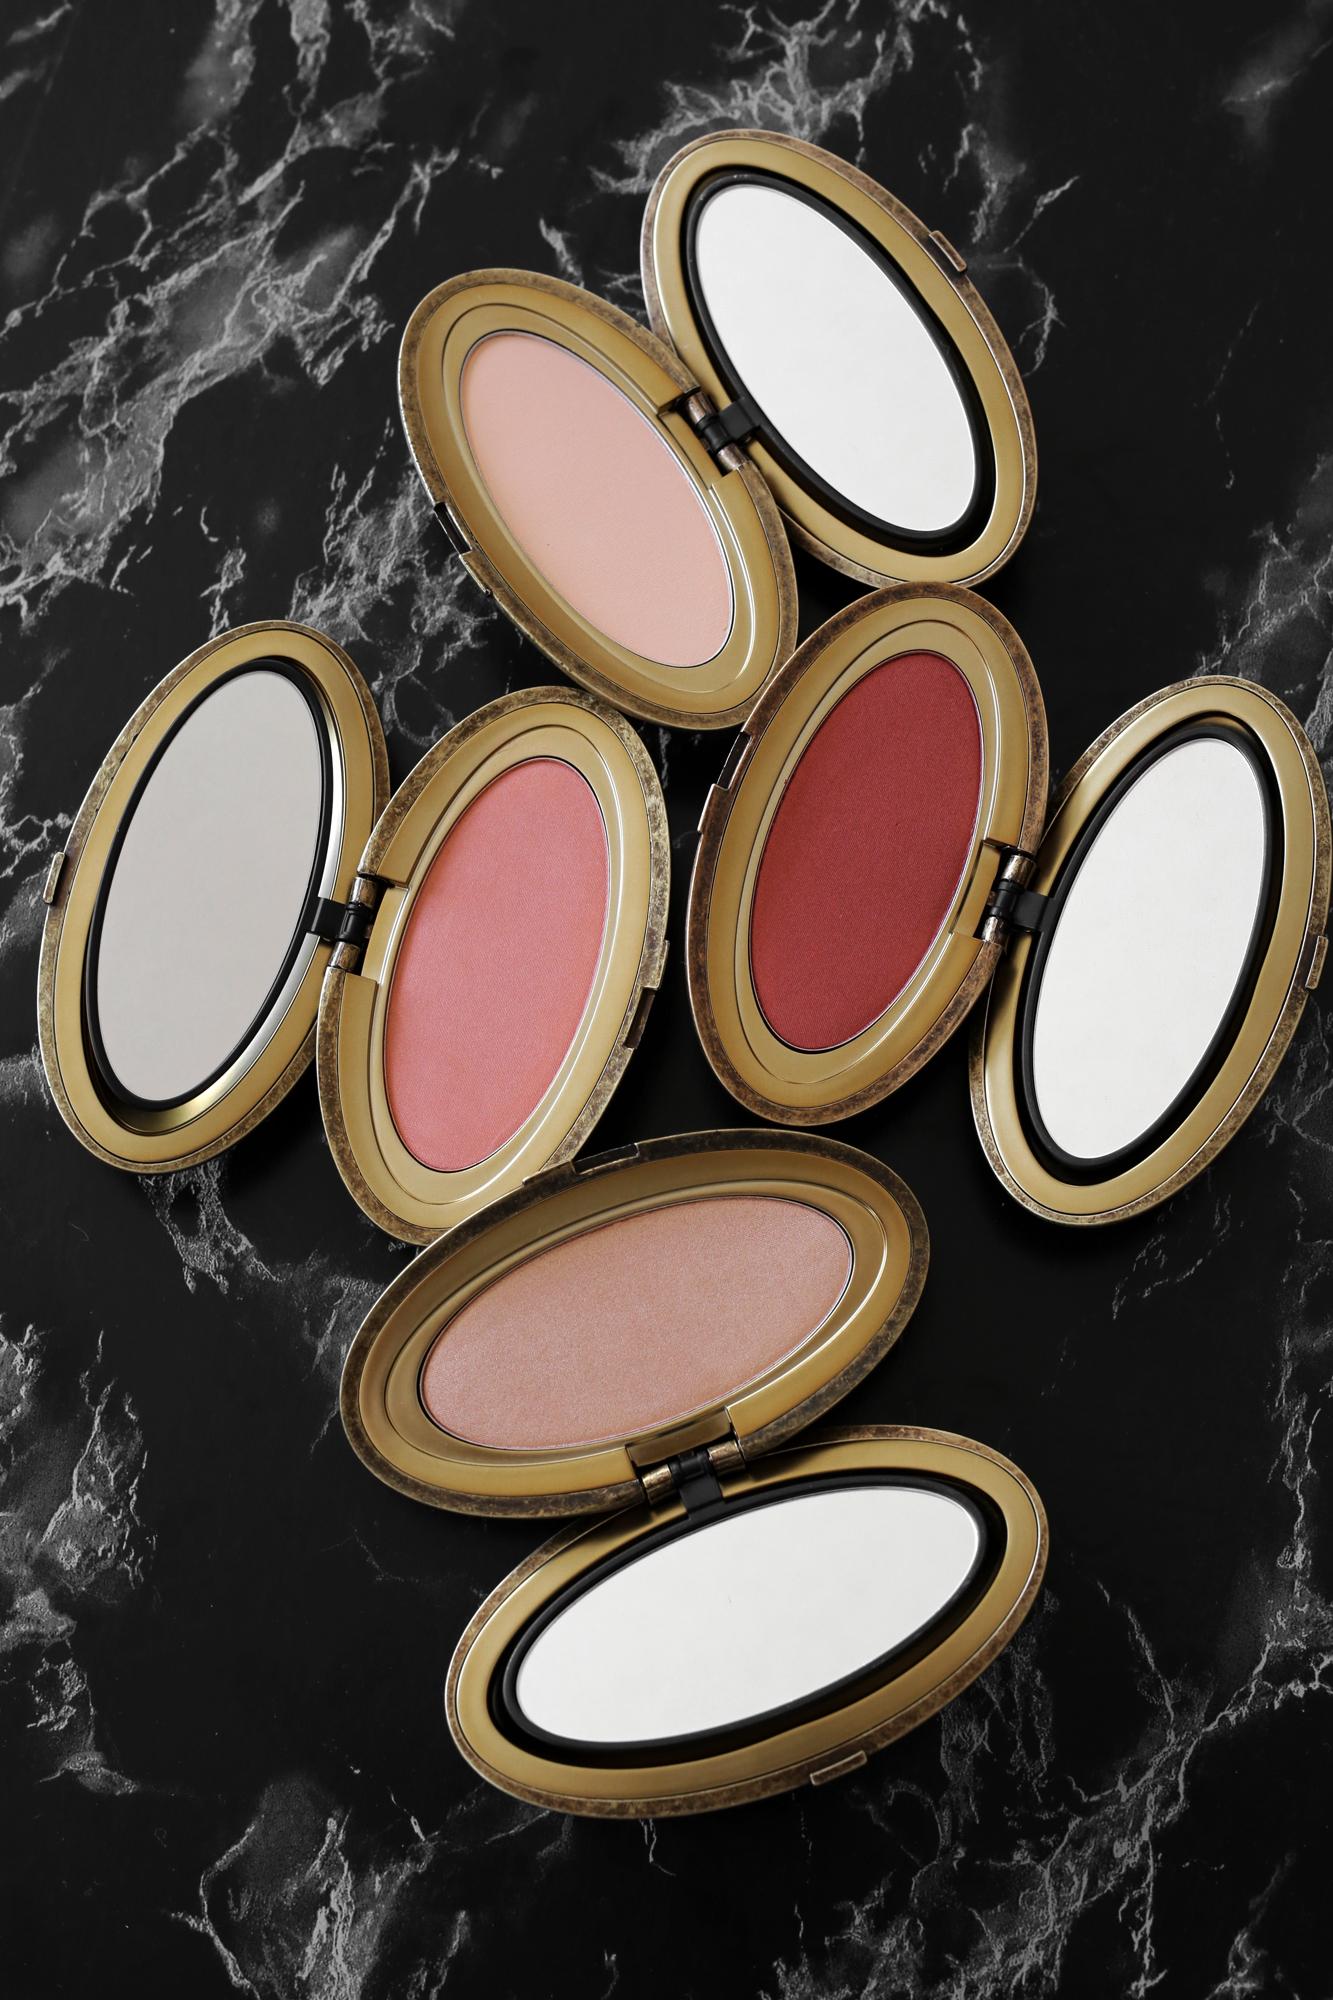 MAC x Robert Lee Morris makeup collection 2017 lipstick, blush, powder, compact, brush, beauty_5500.jpg